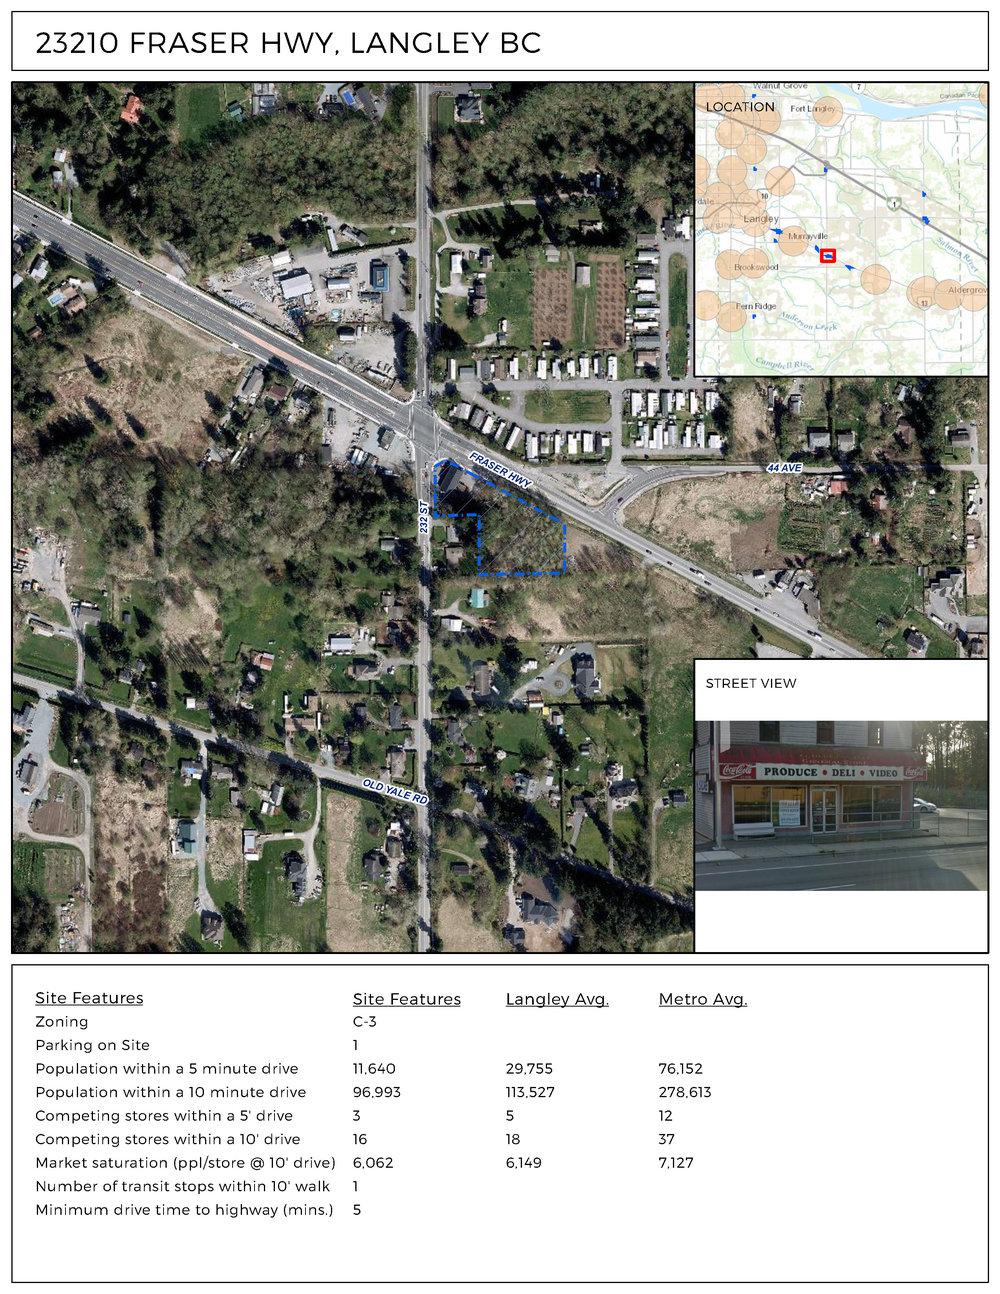 Site evaluation for a potential liquor store location